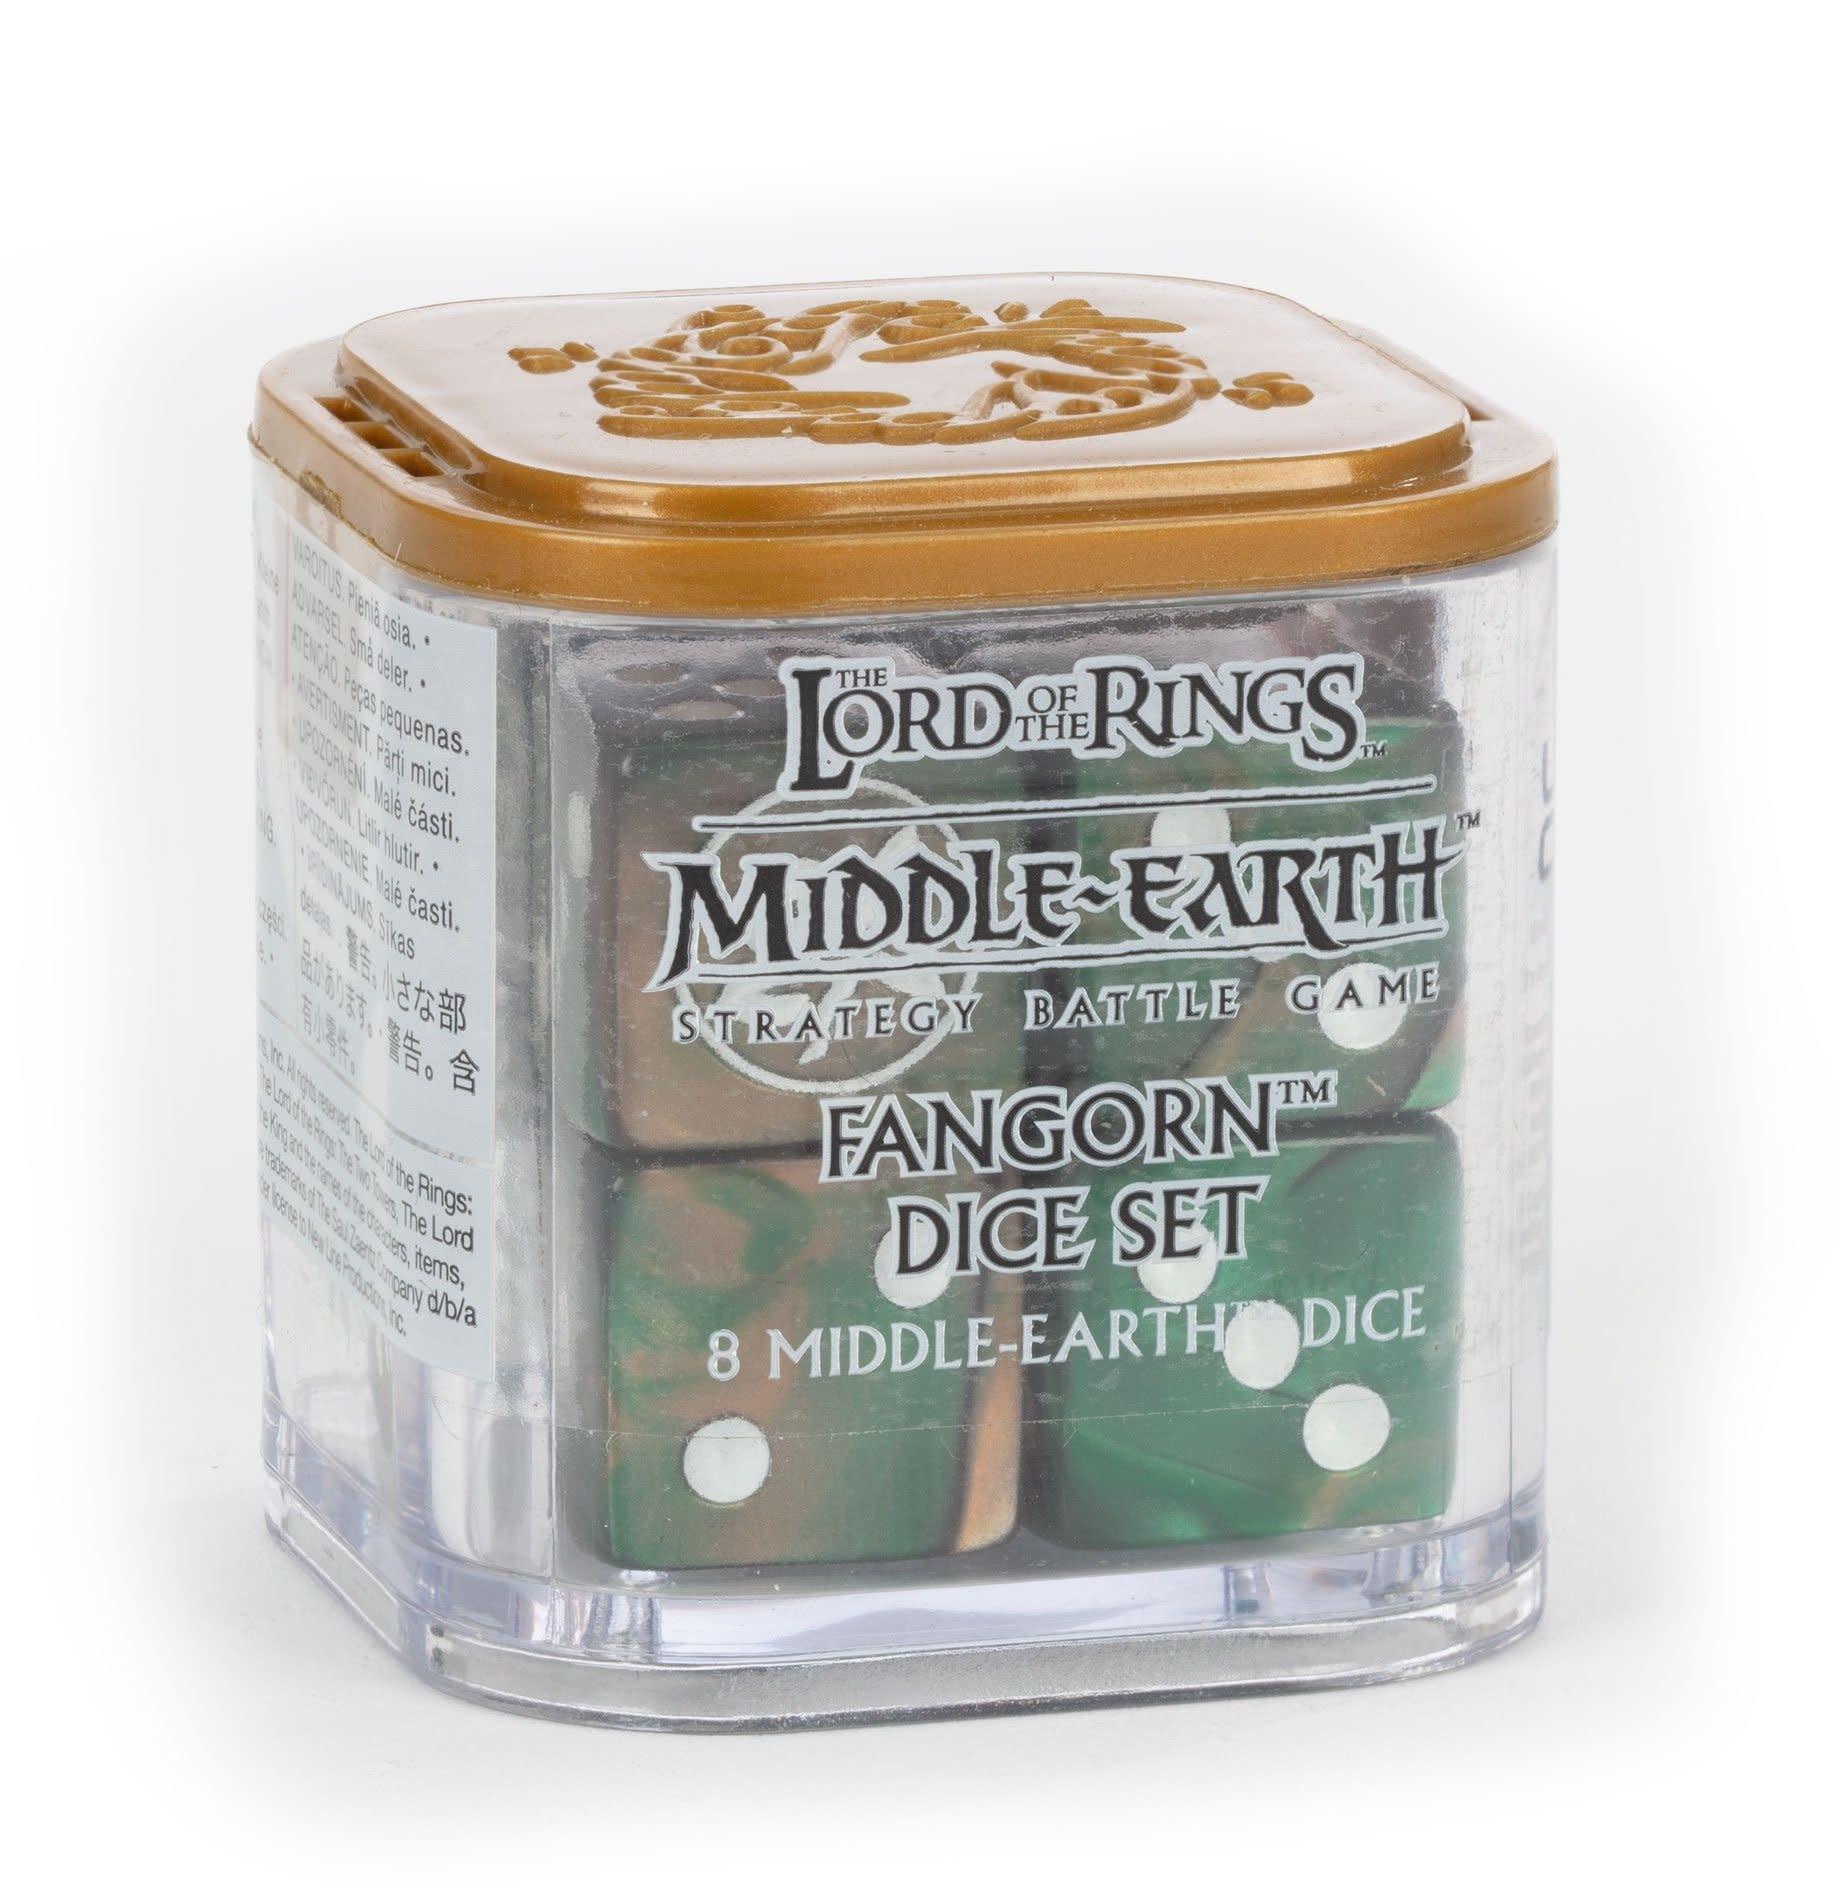 Games-Workshop Middle-earth:  FangornTM Dice Set